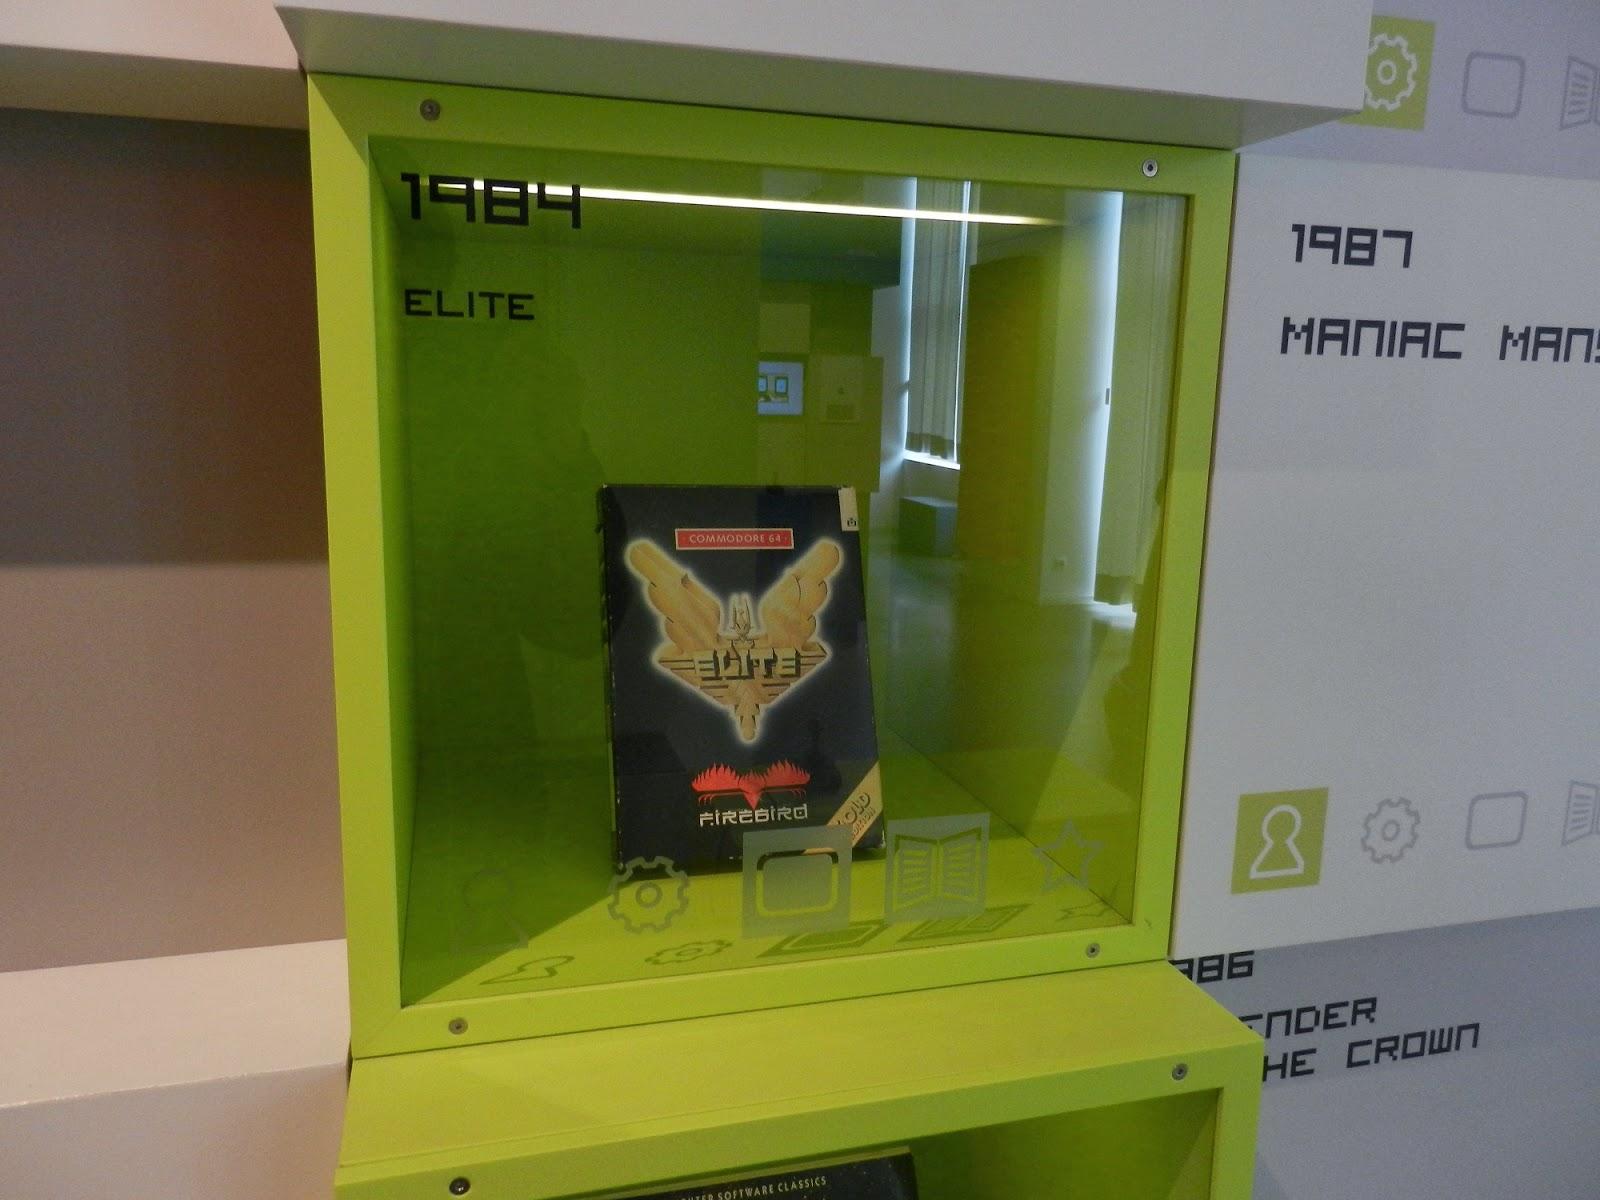 Visita al Computerspielemuseum (2ª parte)